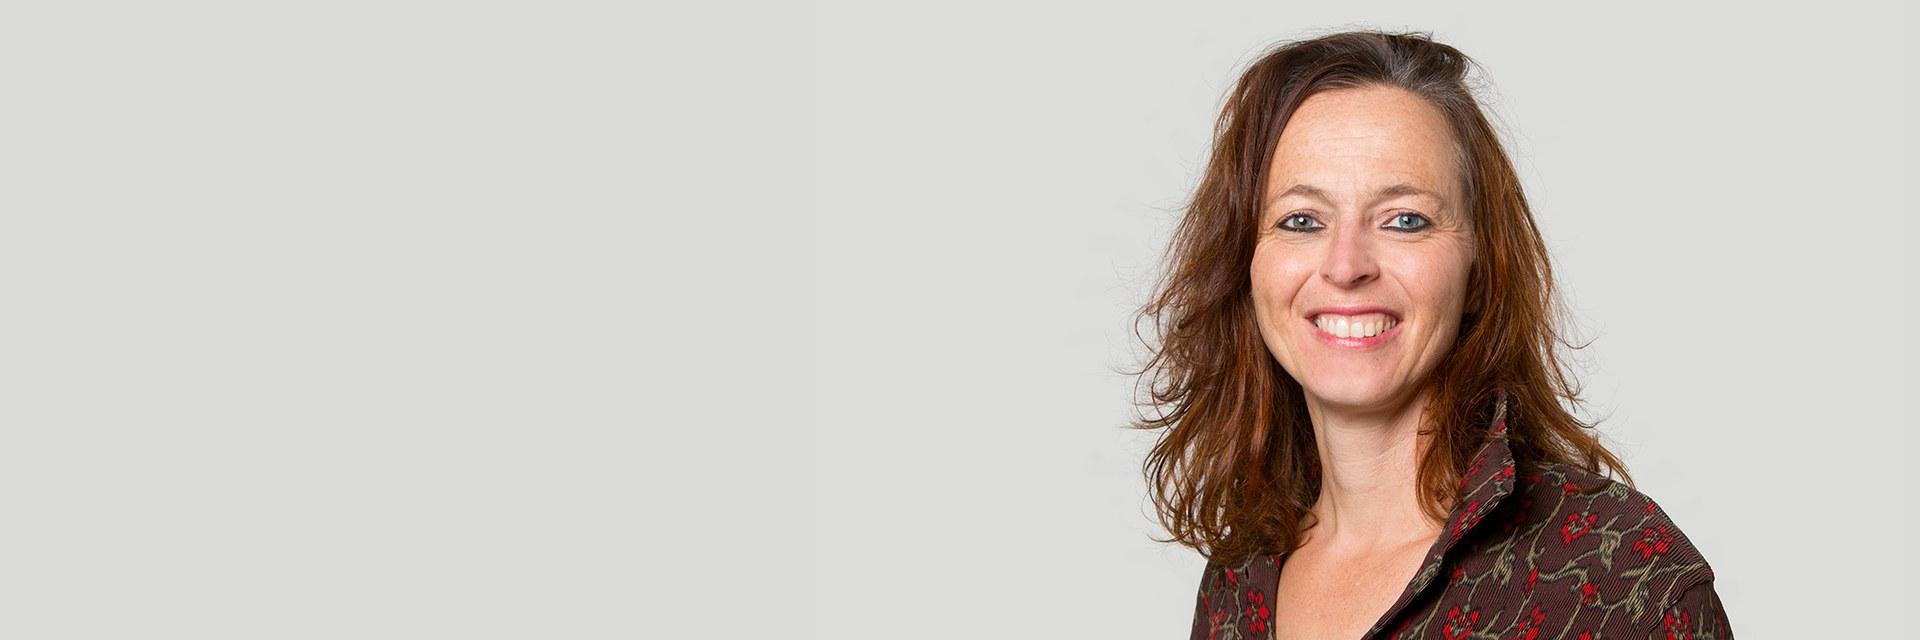 Prof. Irene Abderhalden, lic. phil. I